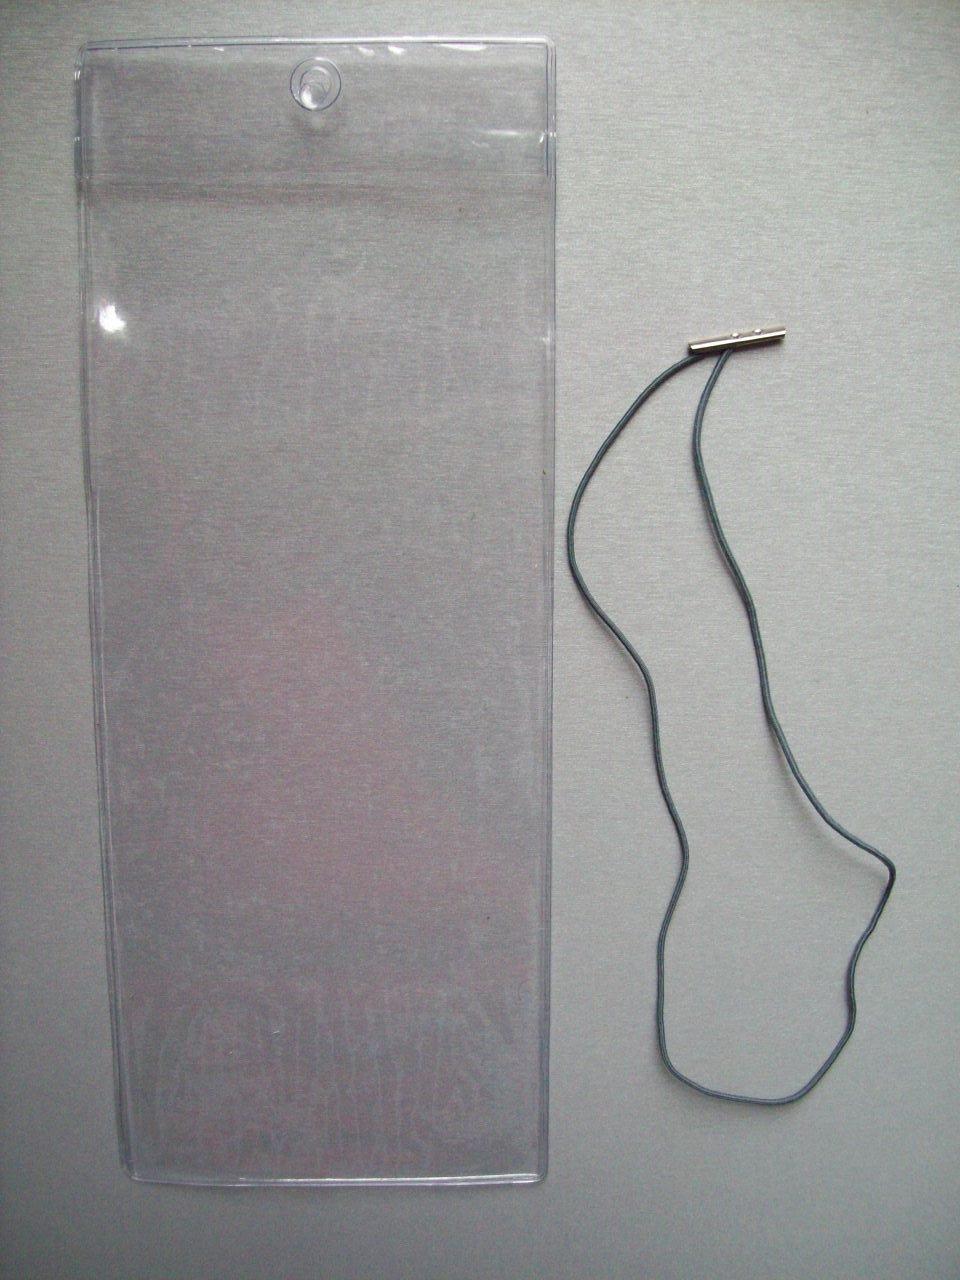 Clear Plastic Vinyl Patio Curtains Walls: 25 Heavy Duty Clear Plastic Vinyl Information Hanging